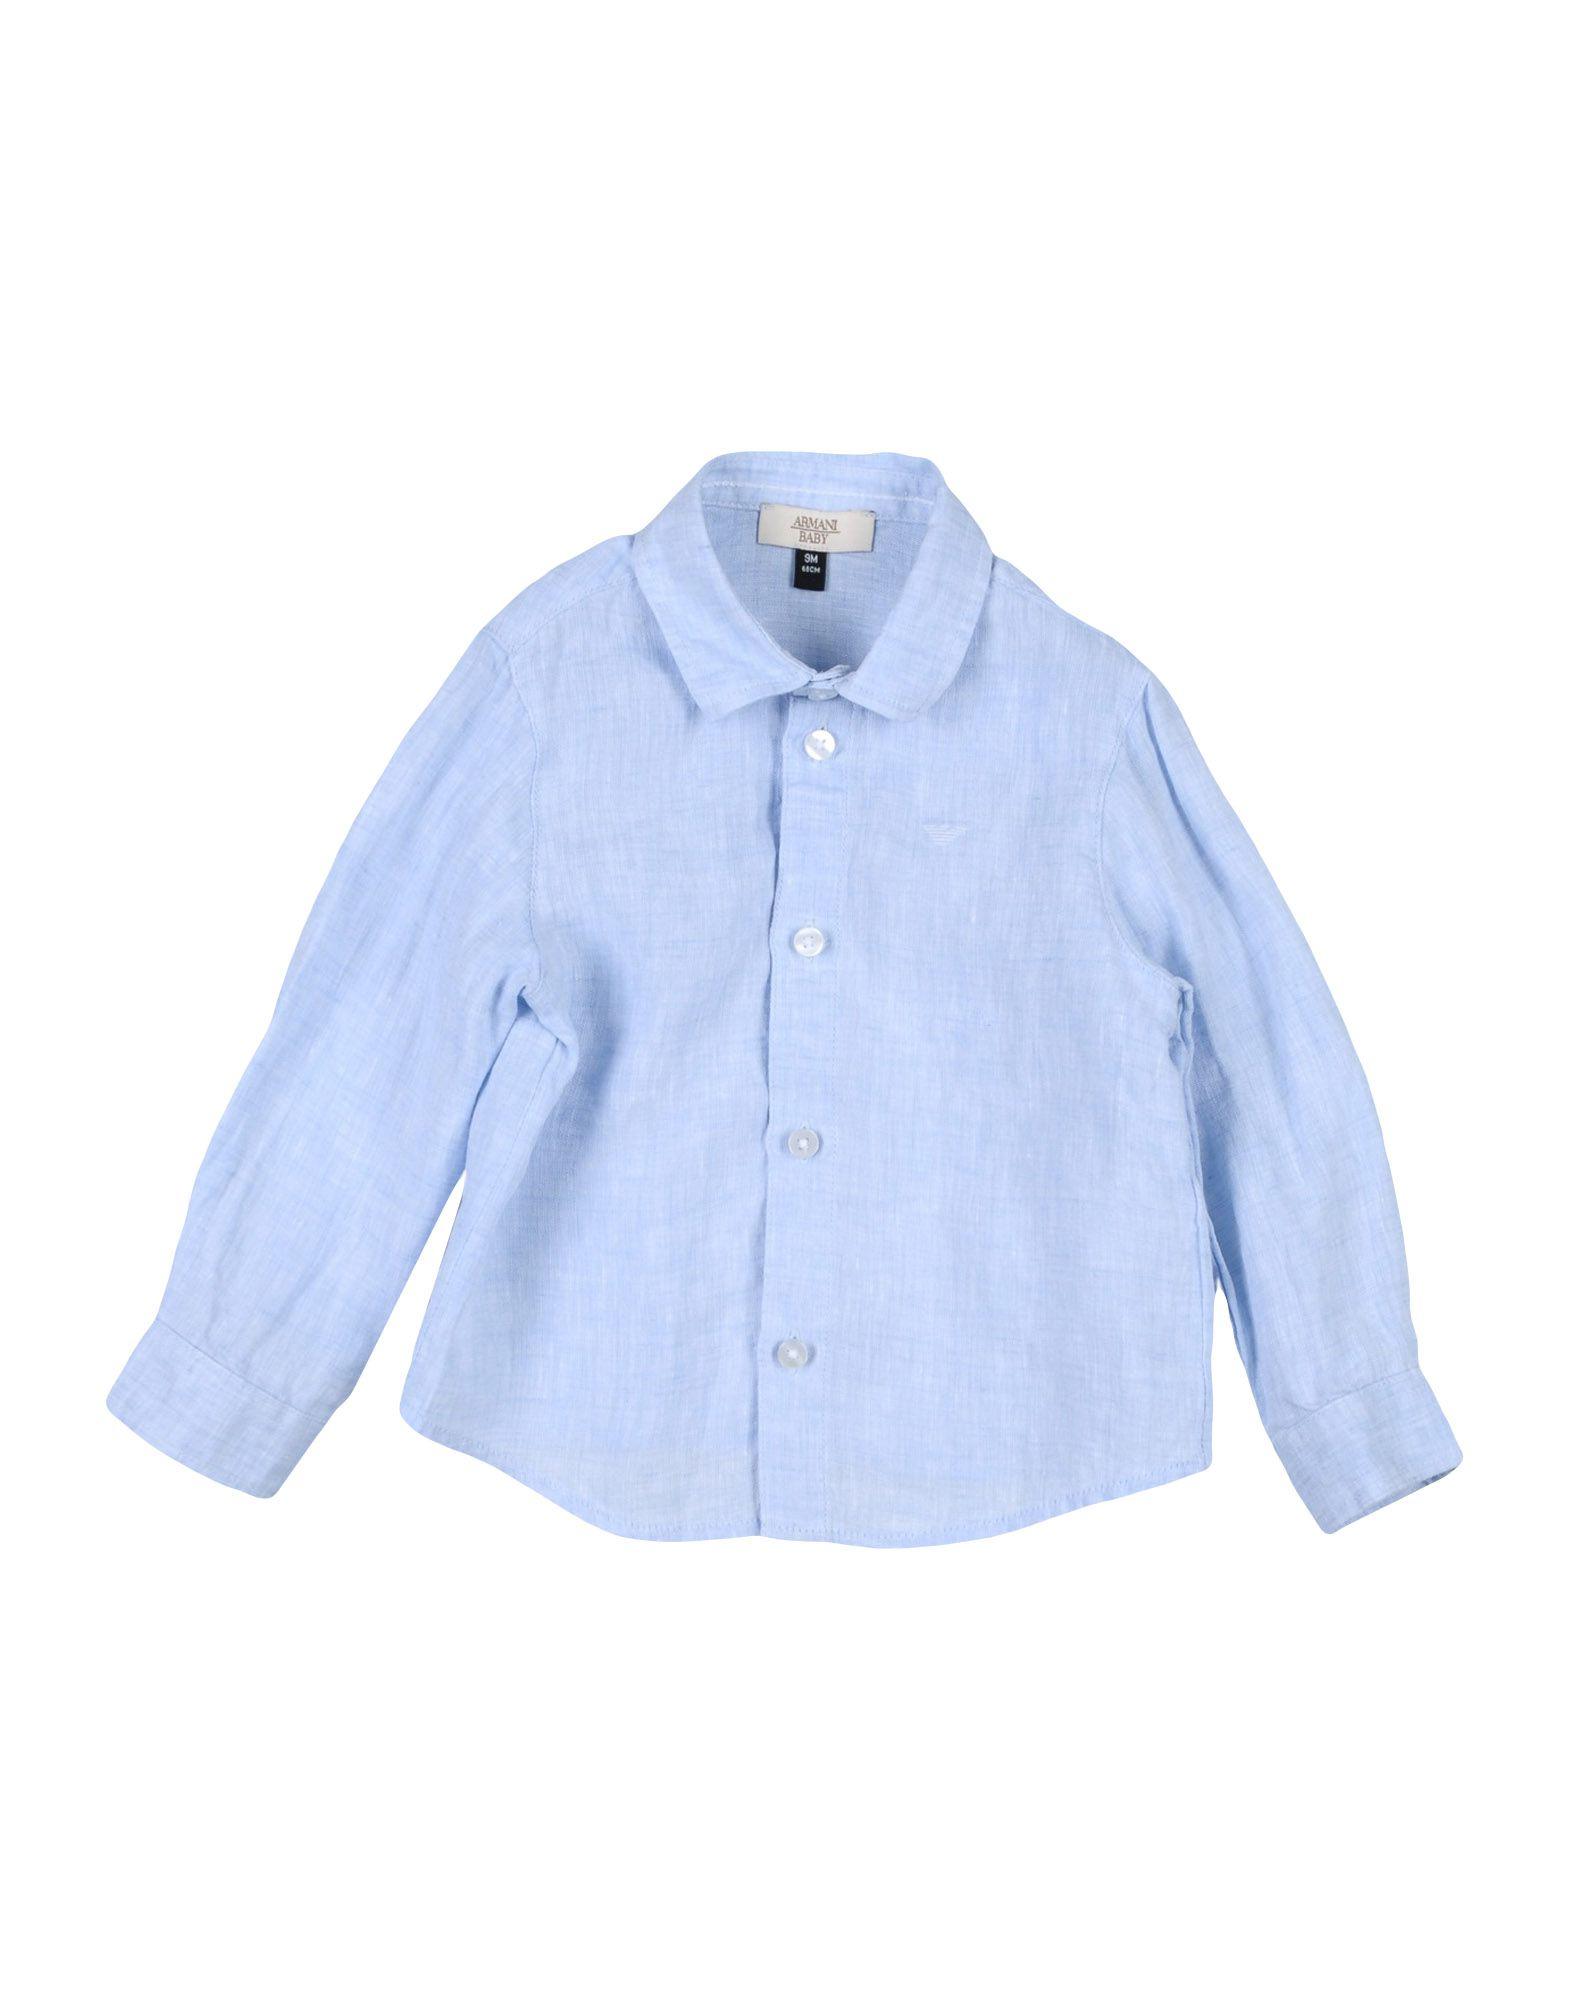 ARMANI JUNIOR Pубашка открывалка для бутылок nadoba sirena